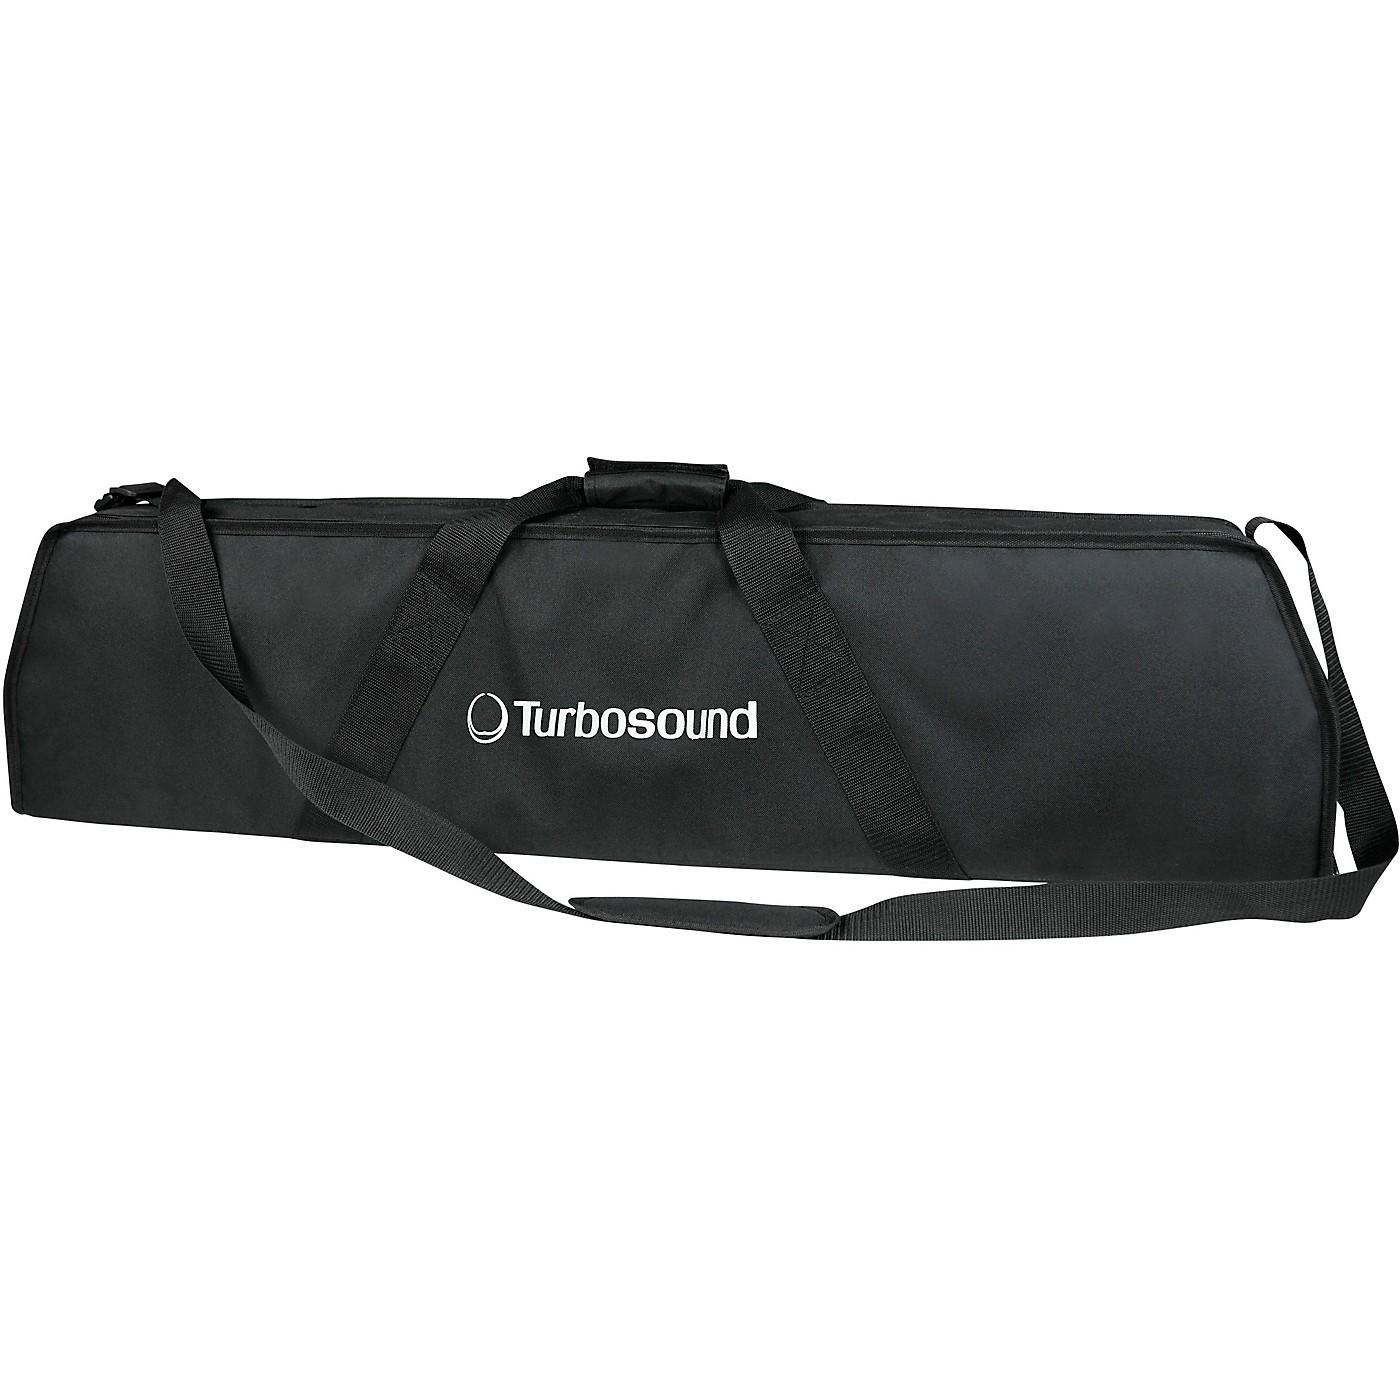 Turbosound iP3000-TB Transport Bag for iP3000 Column Speaker Section thumbnail